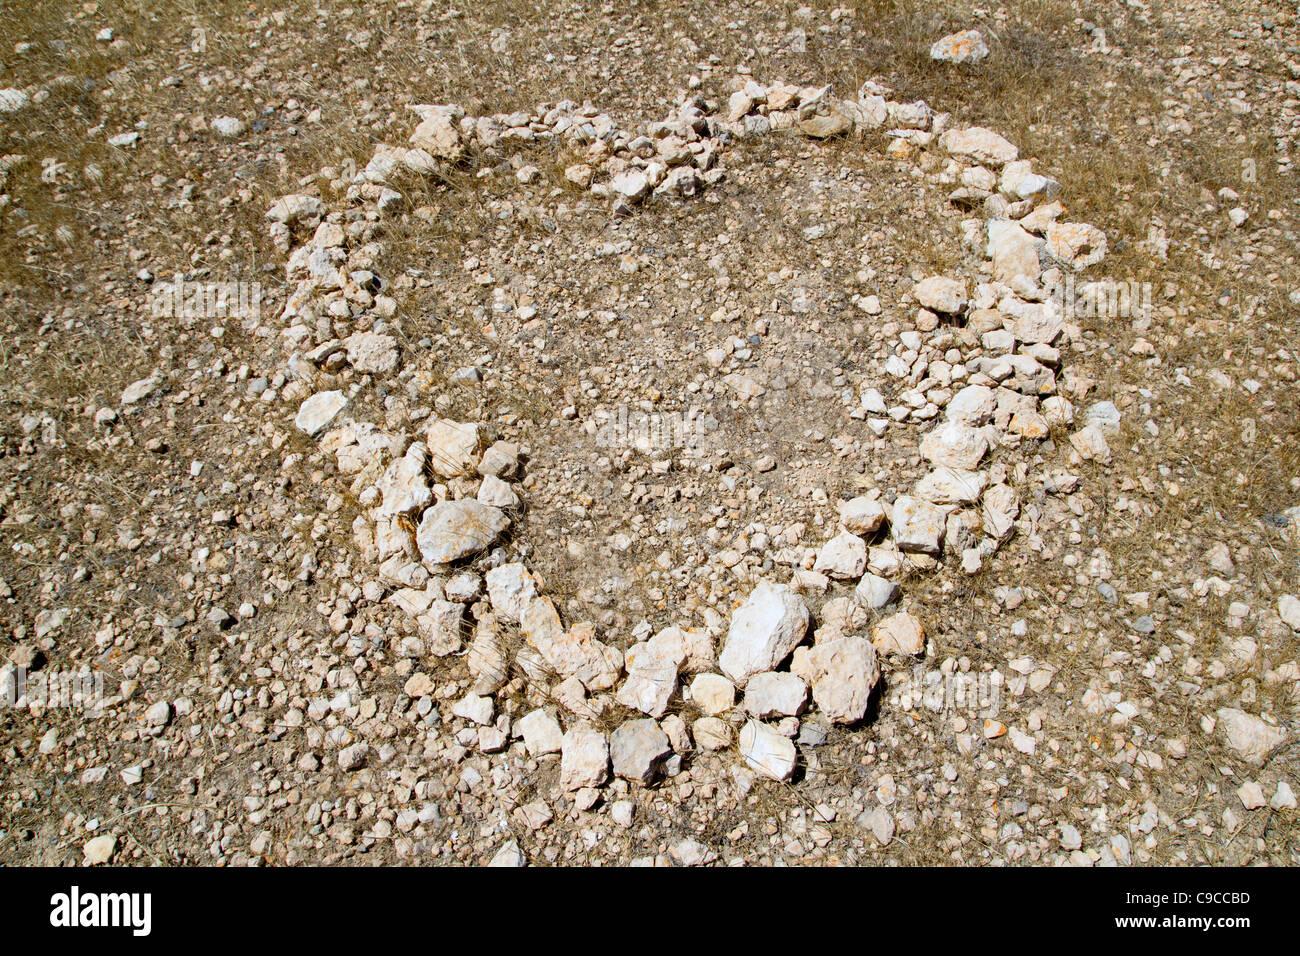 Heart shape symbol of stones like a love metaphor sign - Stock Image